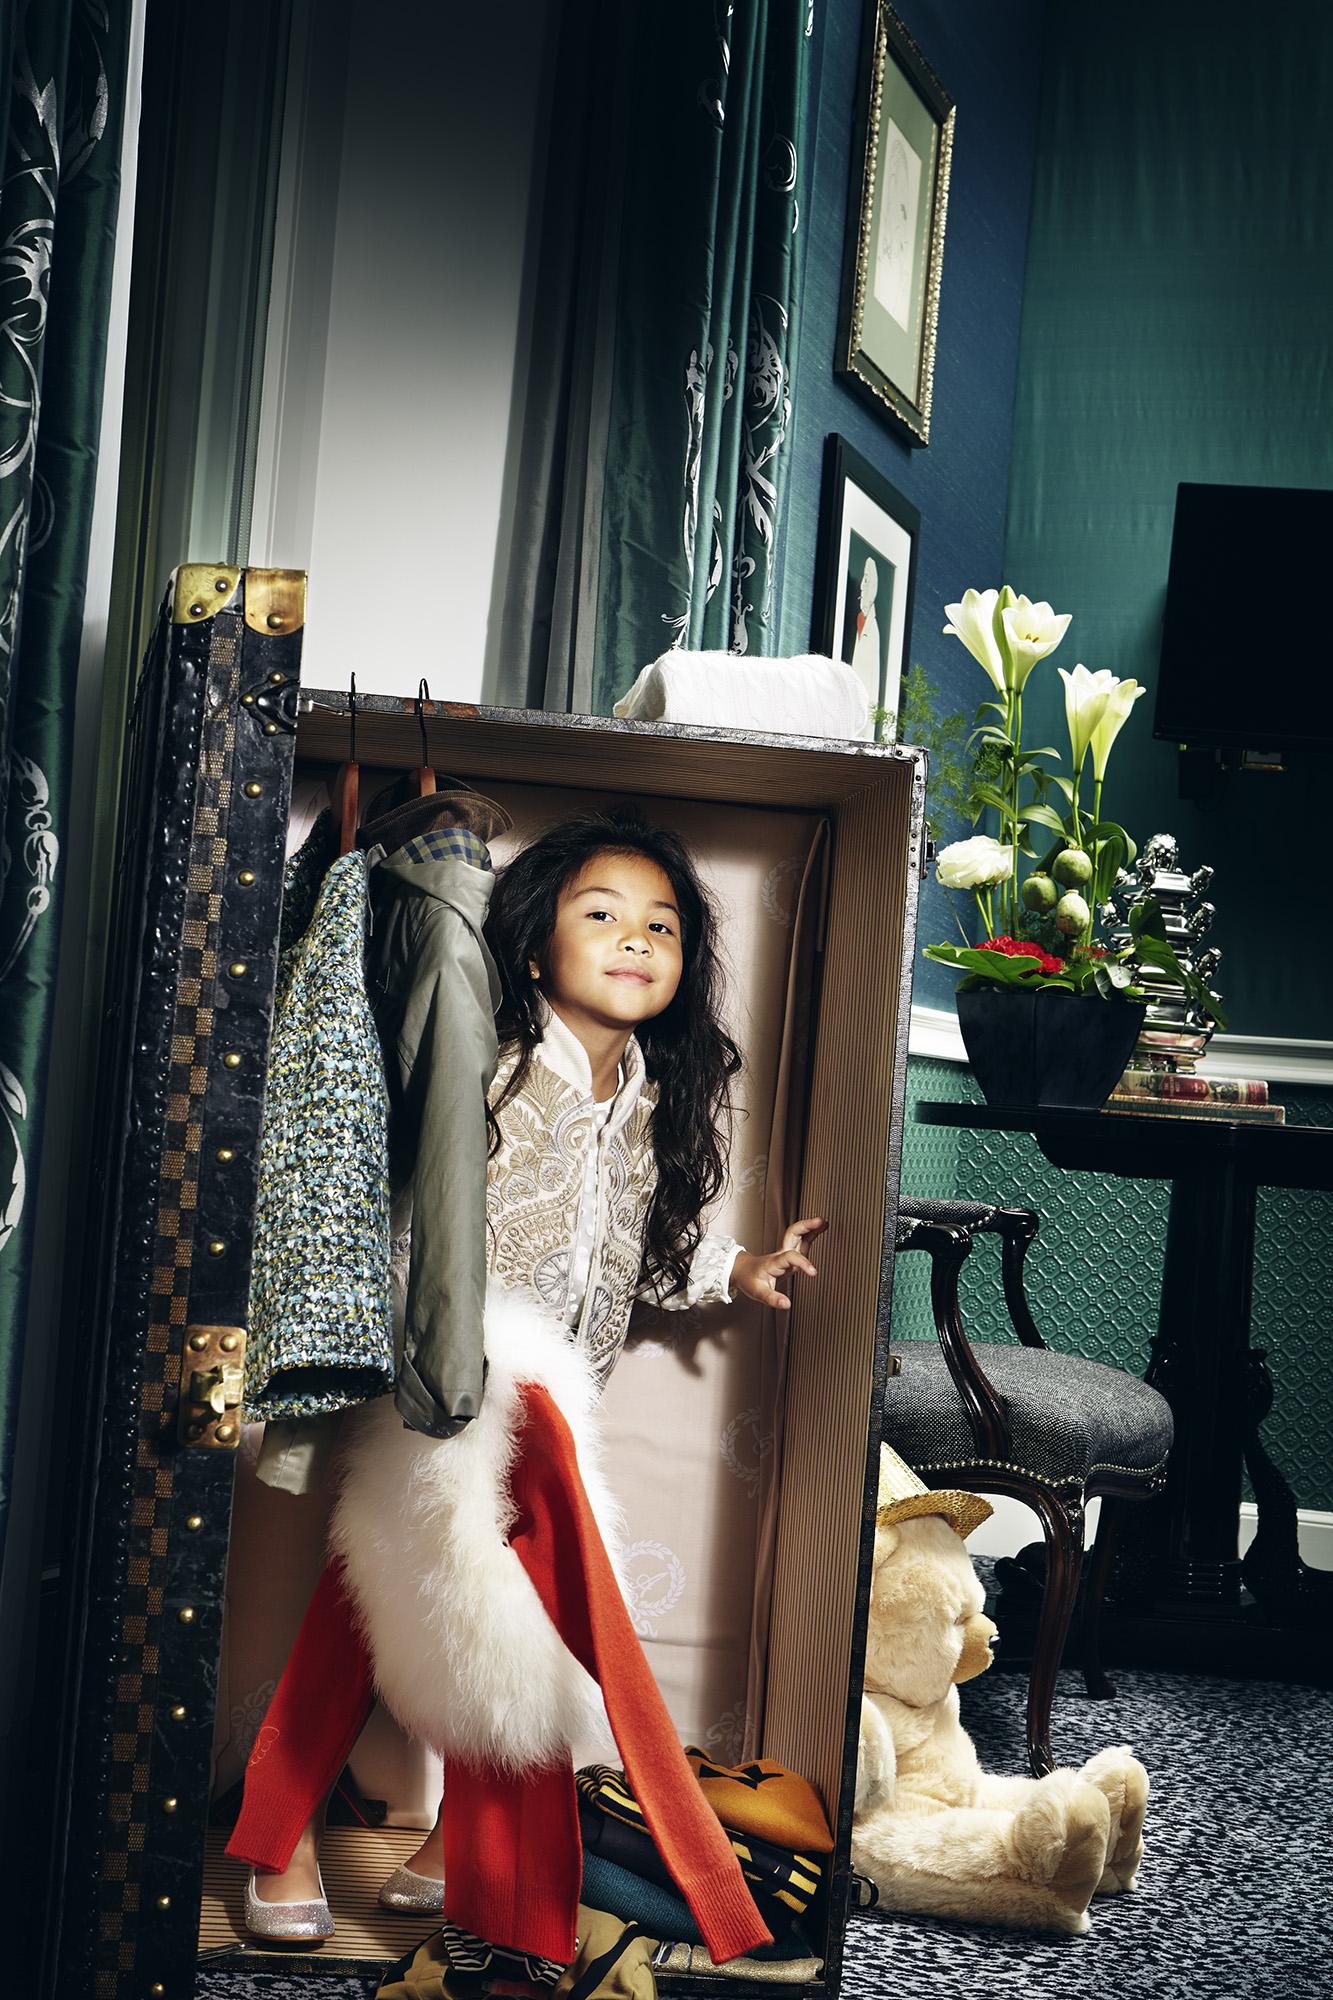 Ilvie Little girl looking through frame